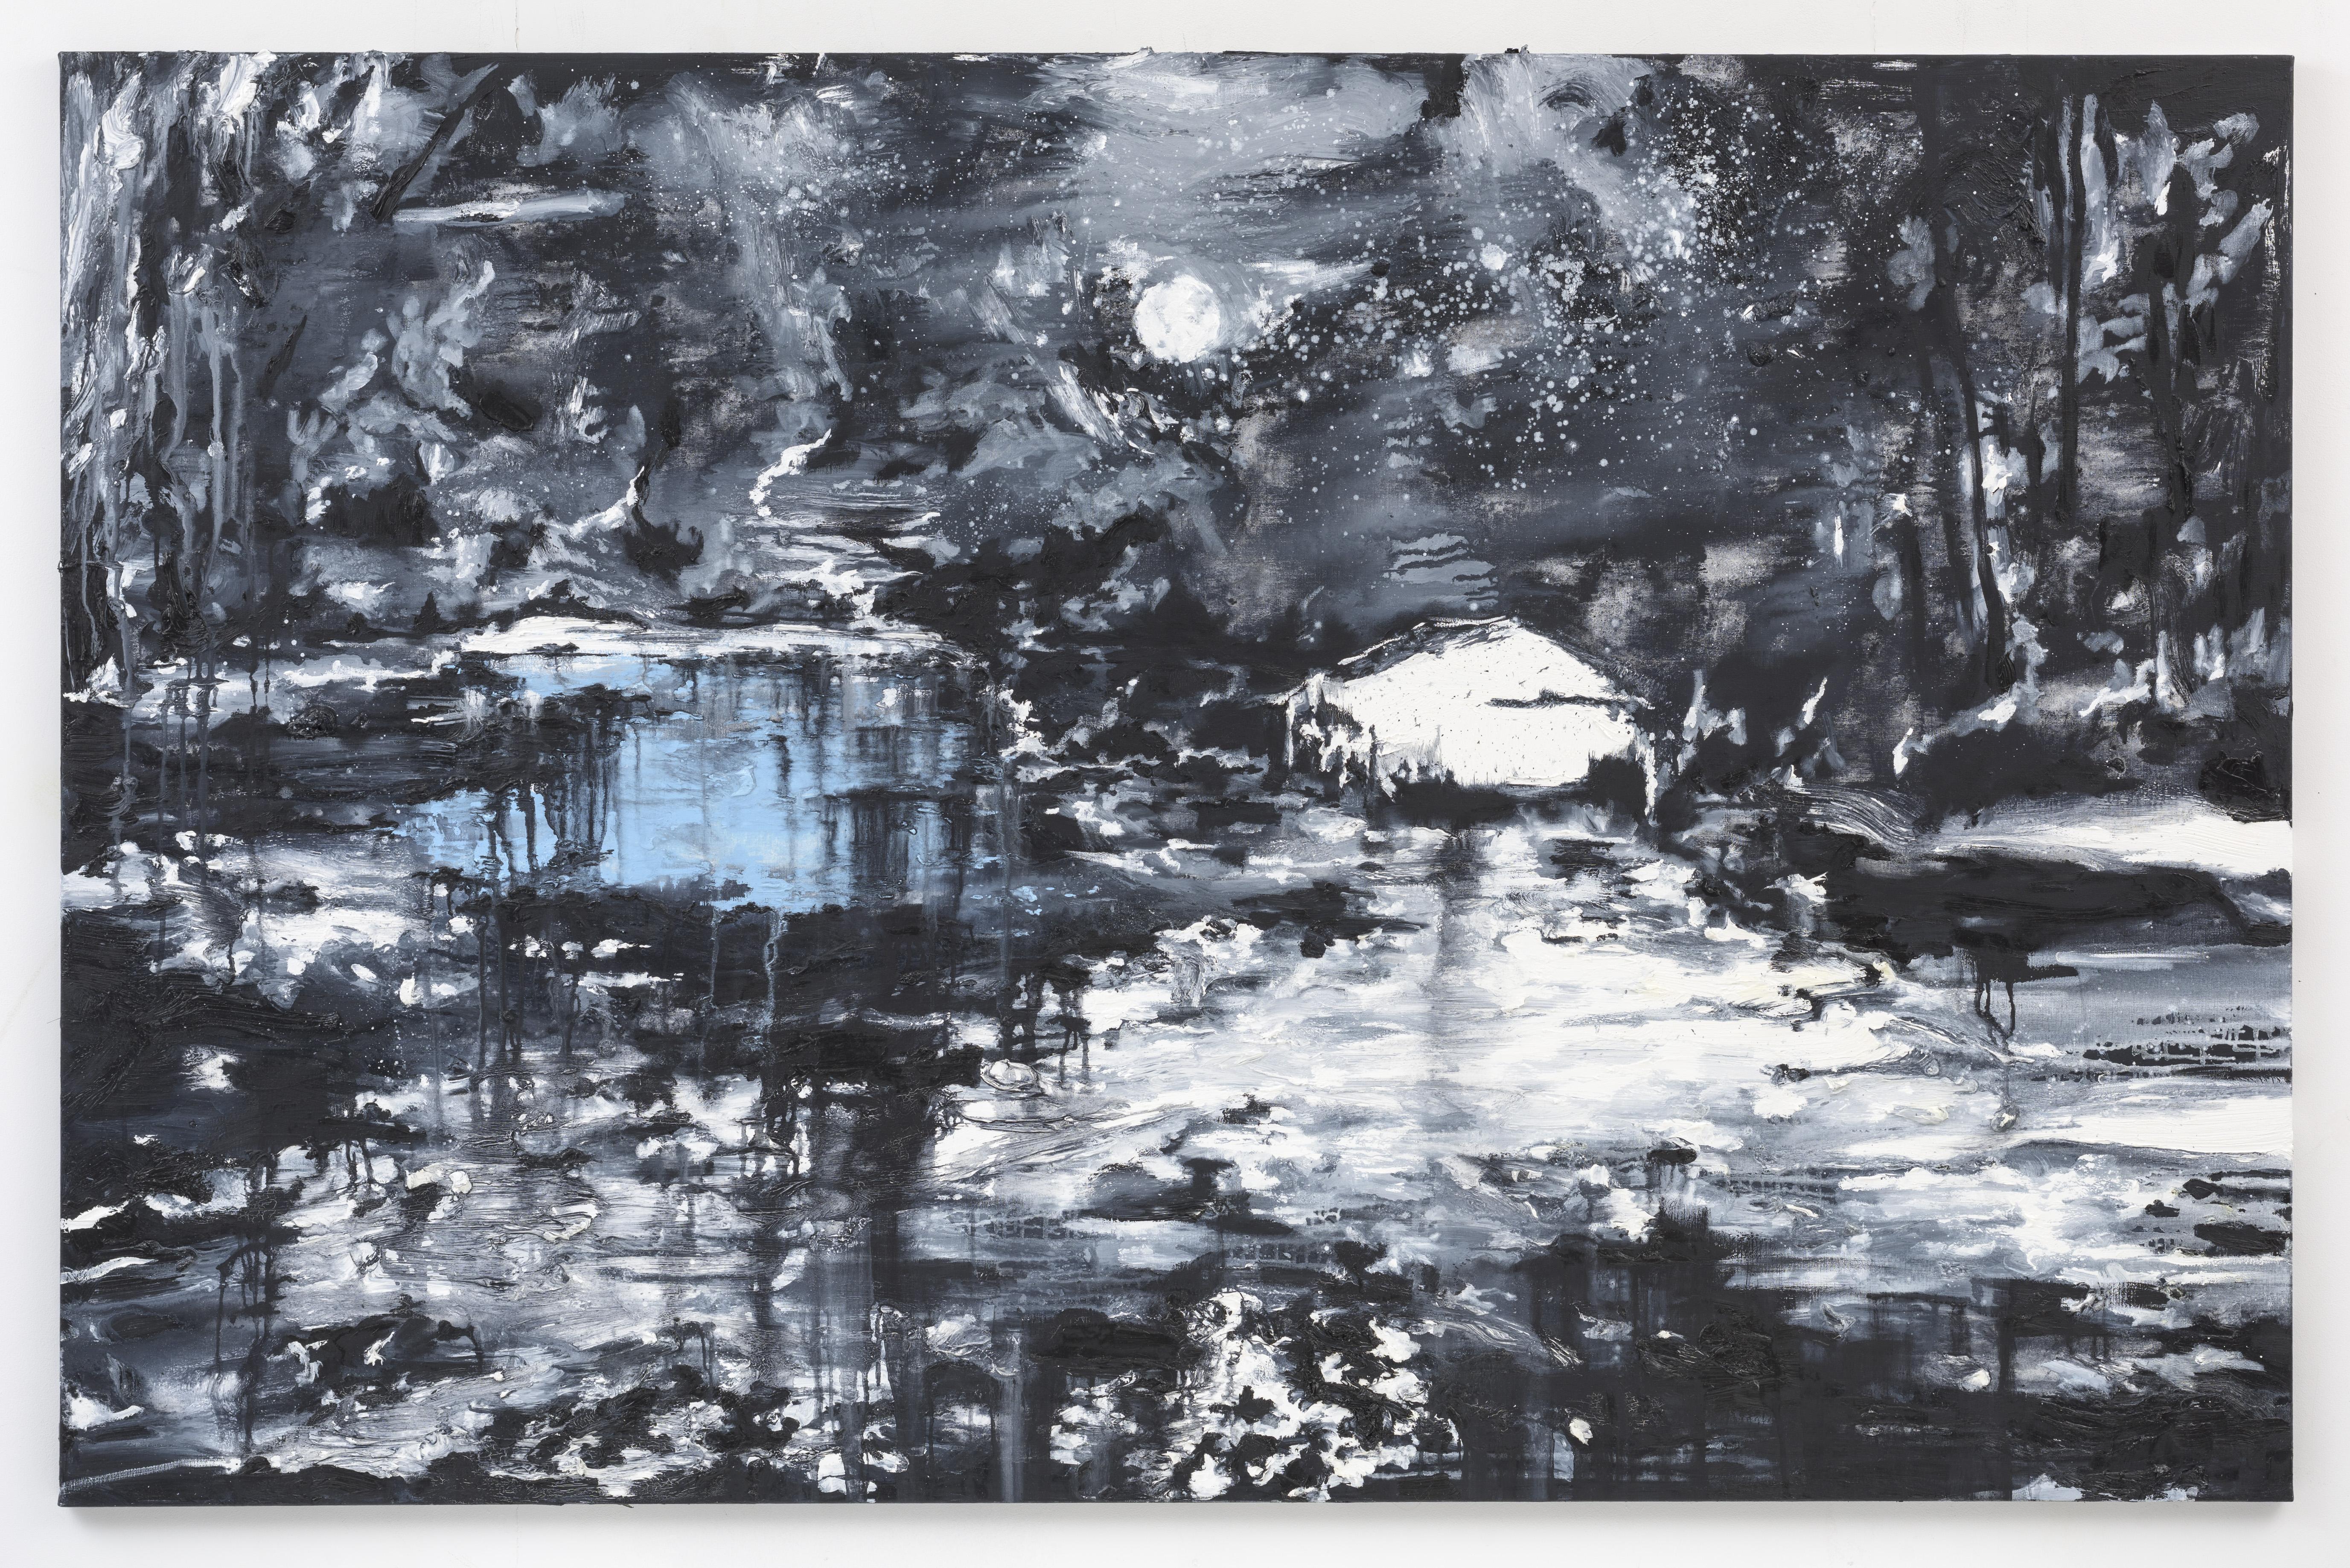 """Noite da Lua Cheia"", 130 x 200 cm. oil on linen 2016 (Portugal)"